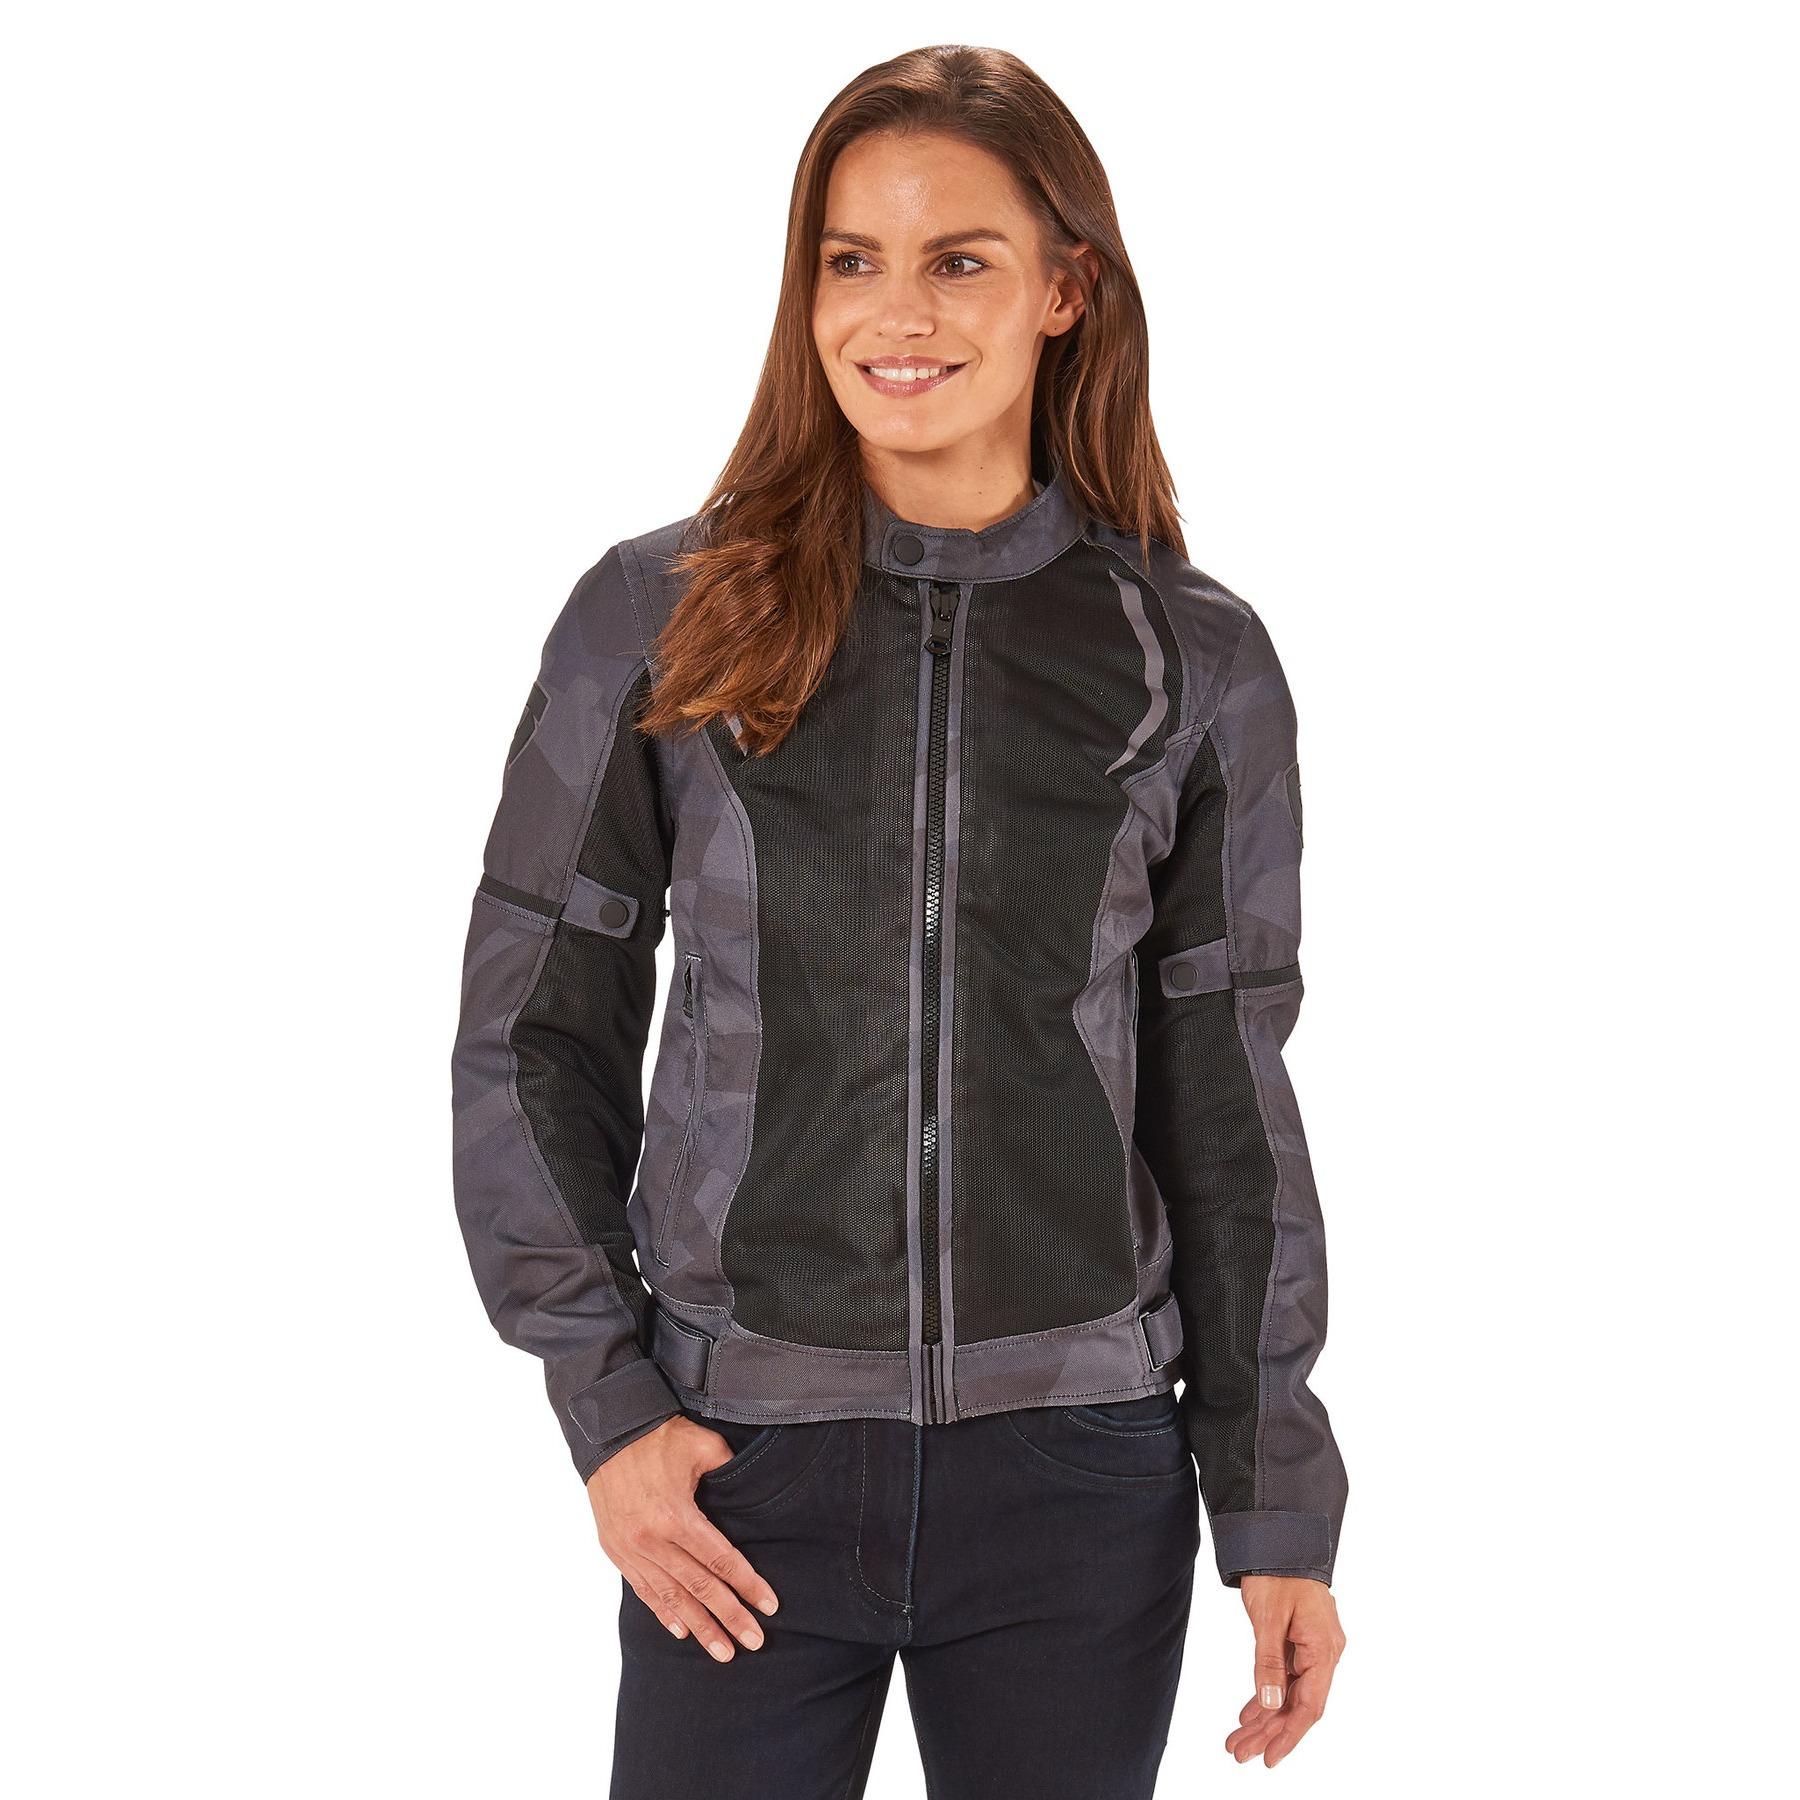 Rev It Torque Motorcycle Jacket